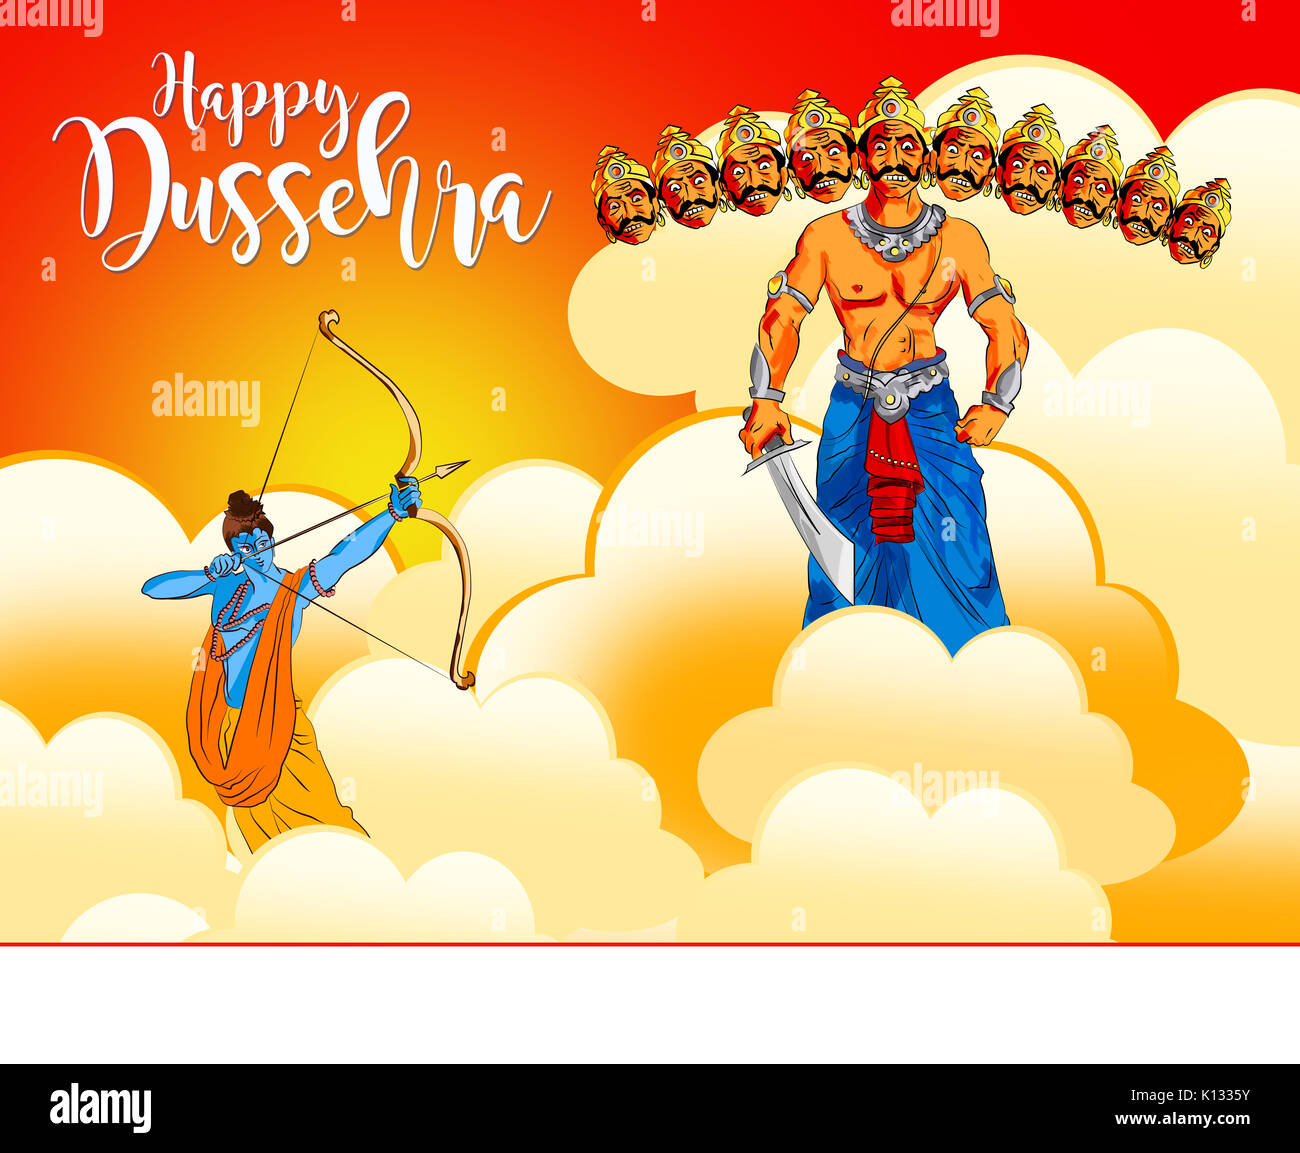 Antique stock illustration of happy dussehra greeting card happy antique stock illustration of happy dussehra greeting card happy vijayadashmi or navaratri important hindu festival in india showing illustration m4hsunfo